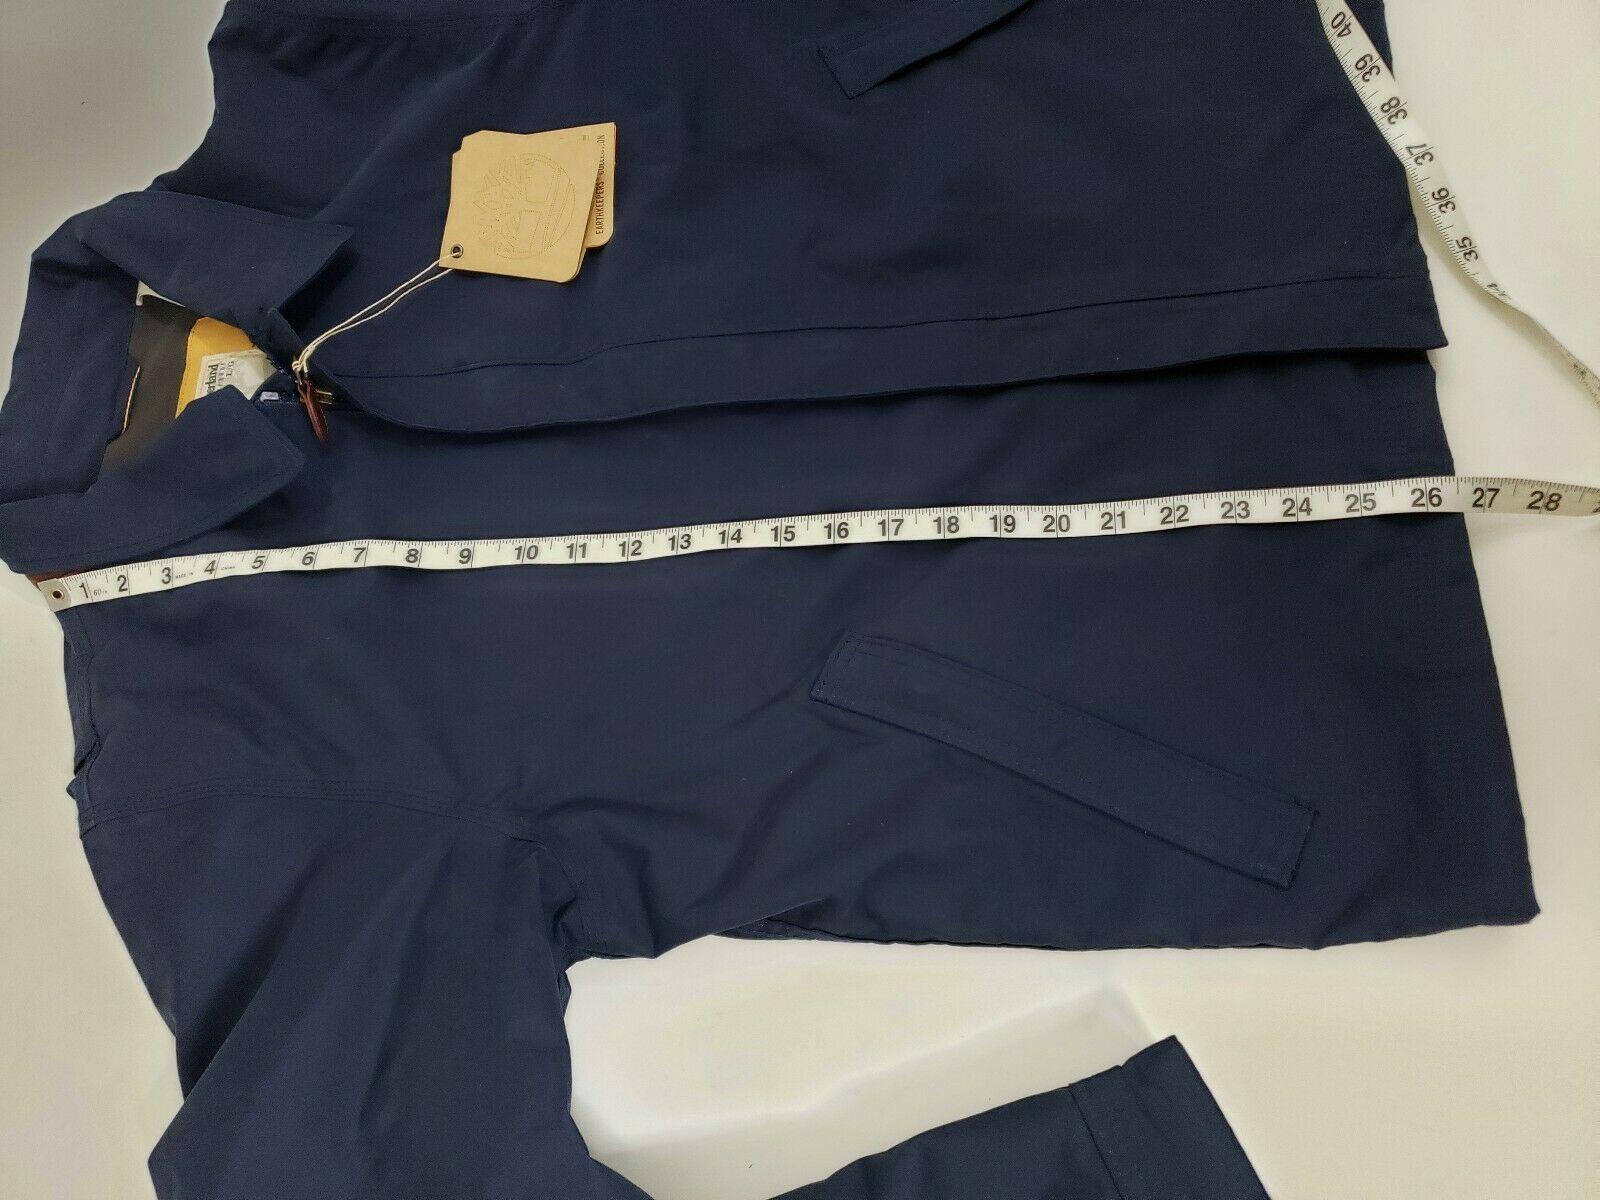 Timberland Mens Earthkeepers Waterproof Hooded Jacket Fleece Size Large NEW